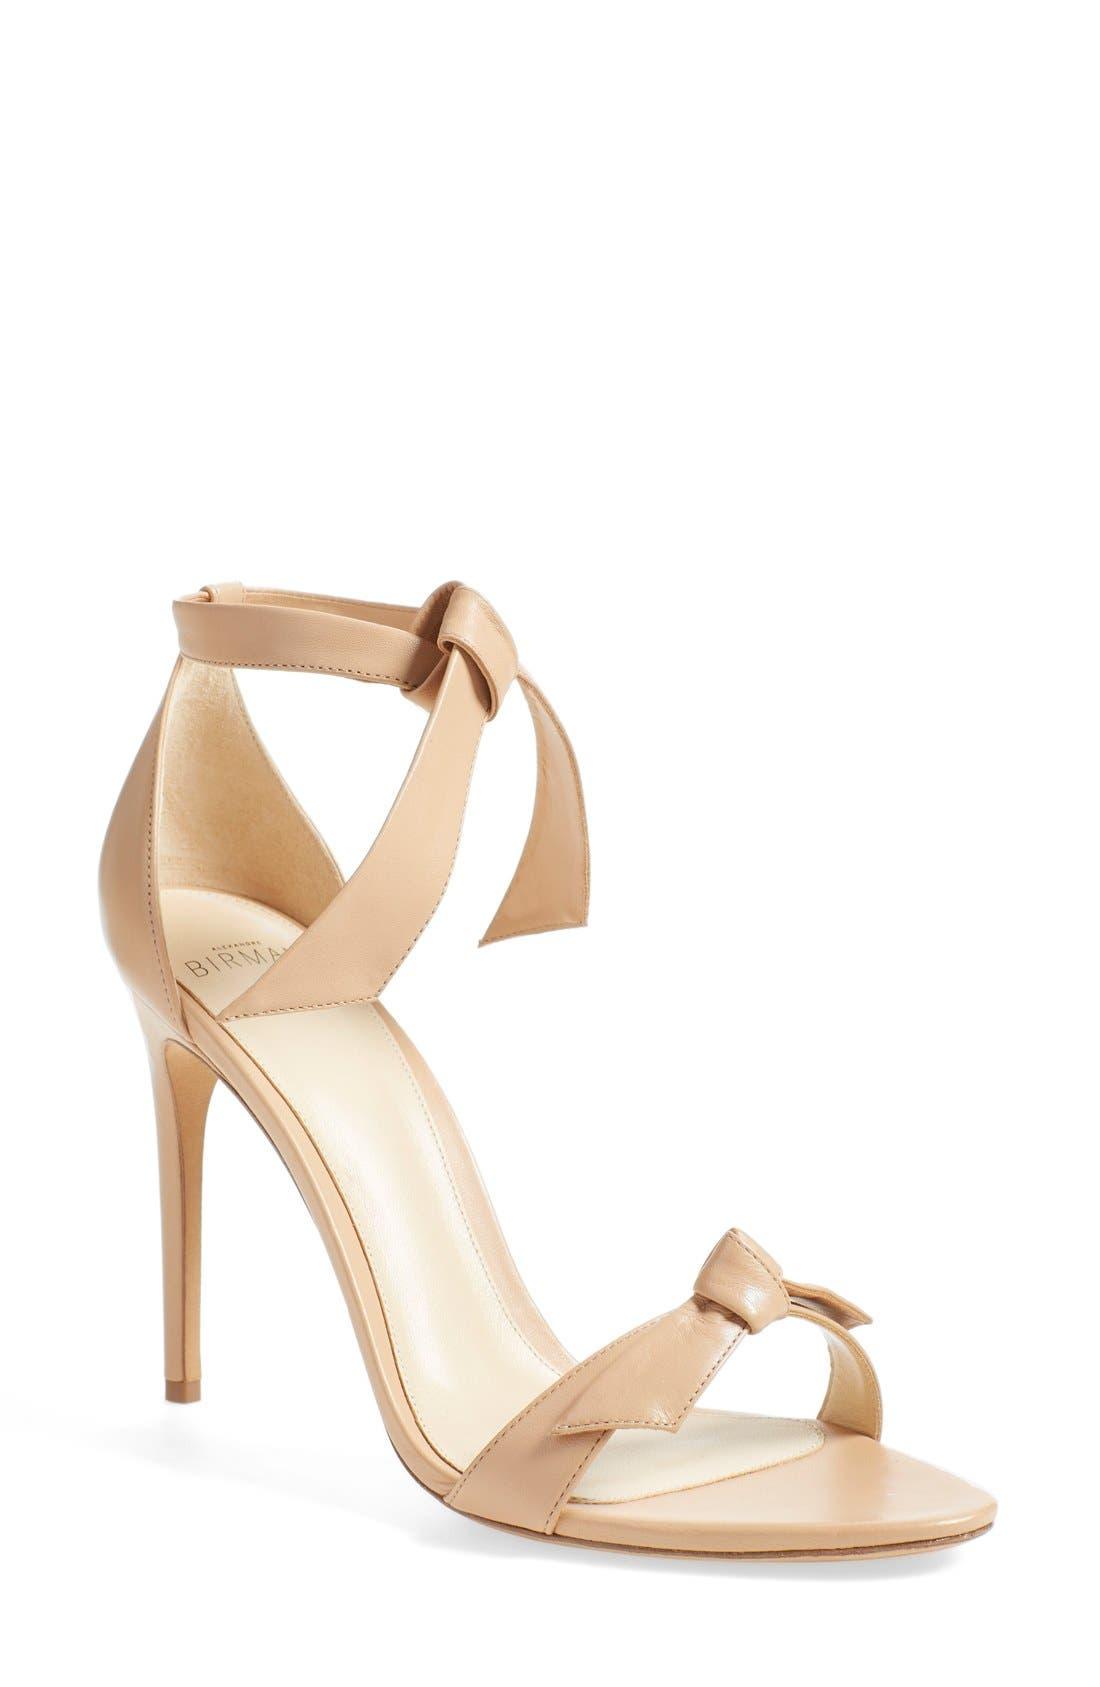 'Clarita' Ankle Tie Sandal,                         Main,                         color, Nude Soft Leather